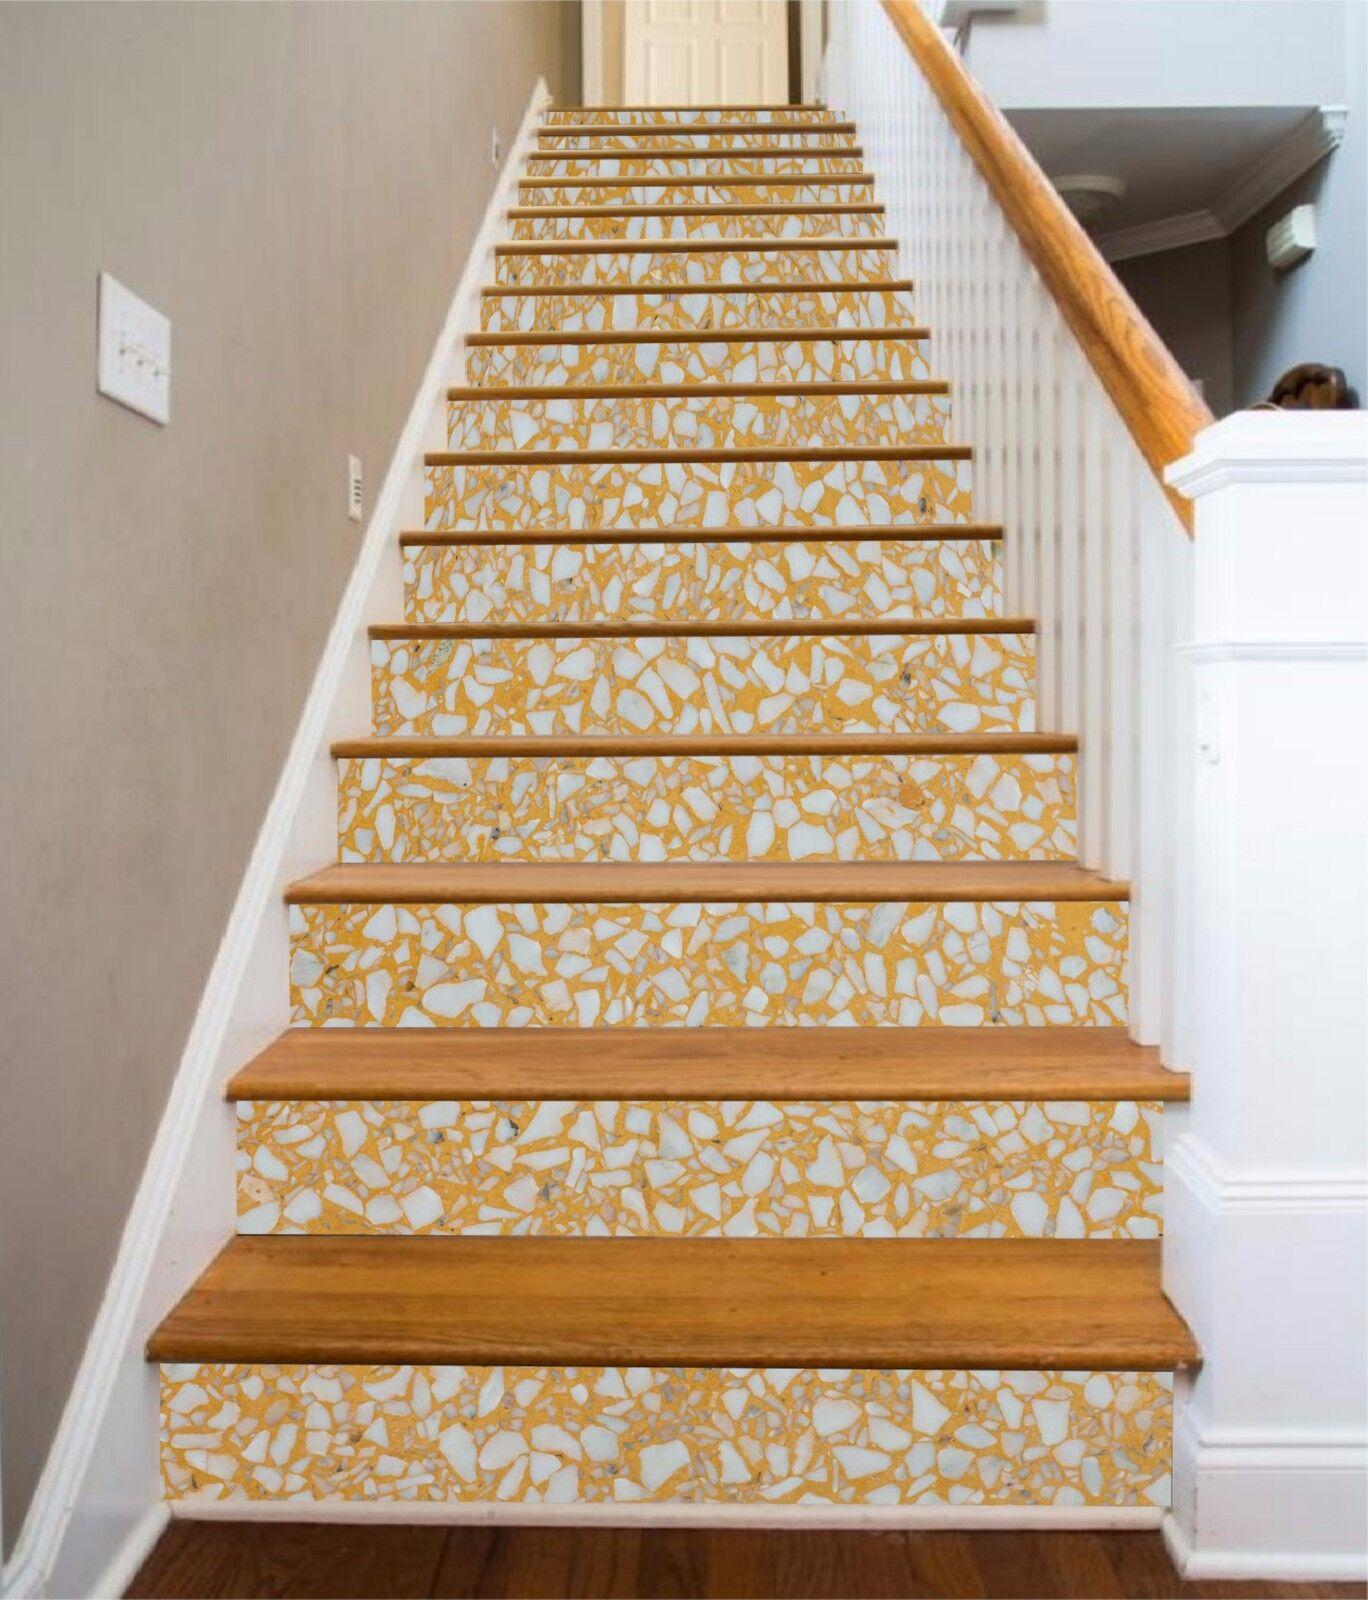 3D Terrazzo Floor 6 Stair Risers Decoration Photo Mural Vinyl Decal WandPapier UK